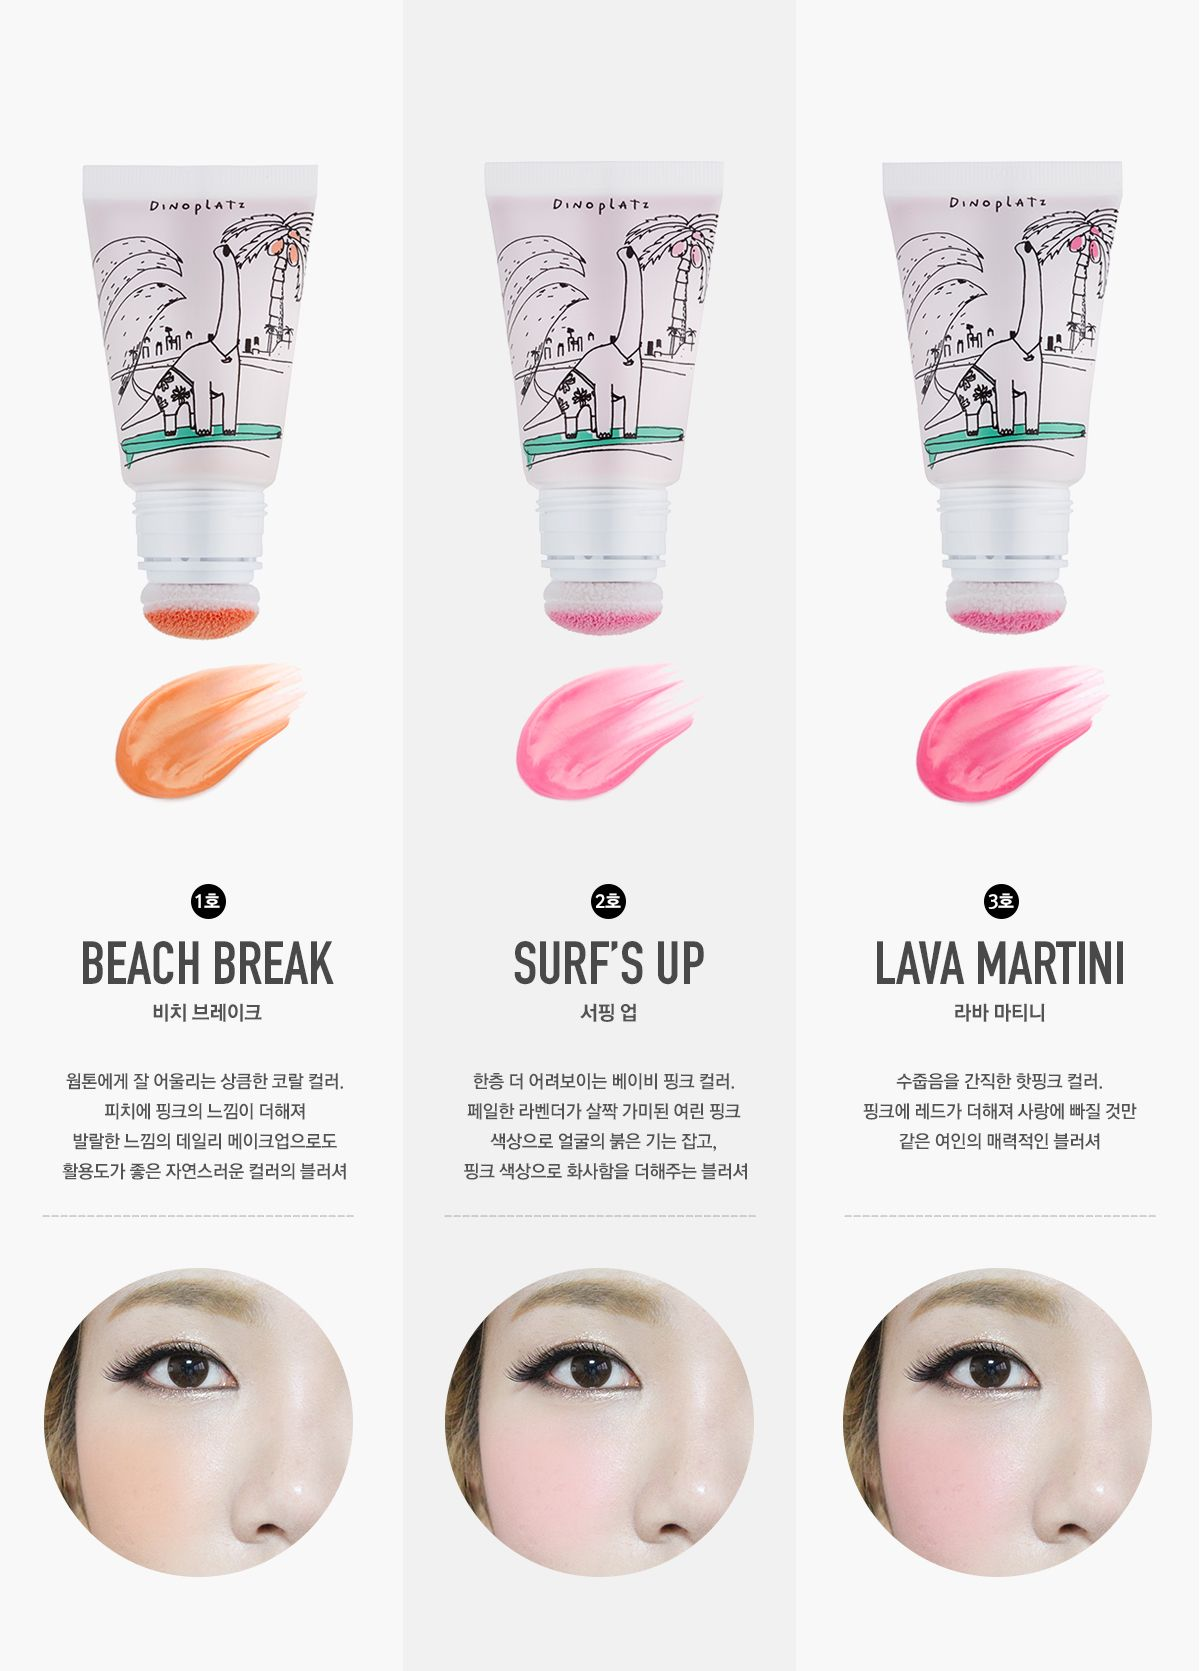 Too Cool For School Dinoplatz Cushy Blush The Cutest Makeup